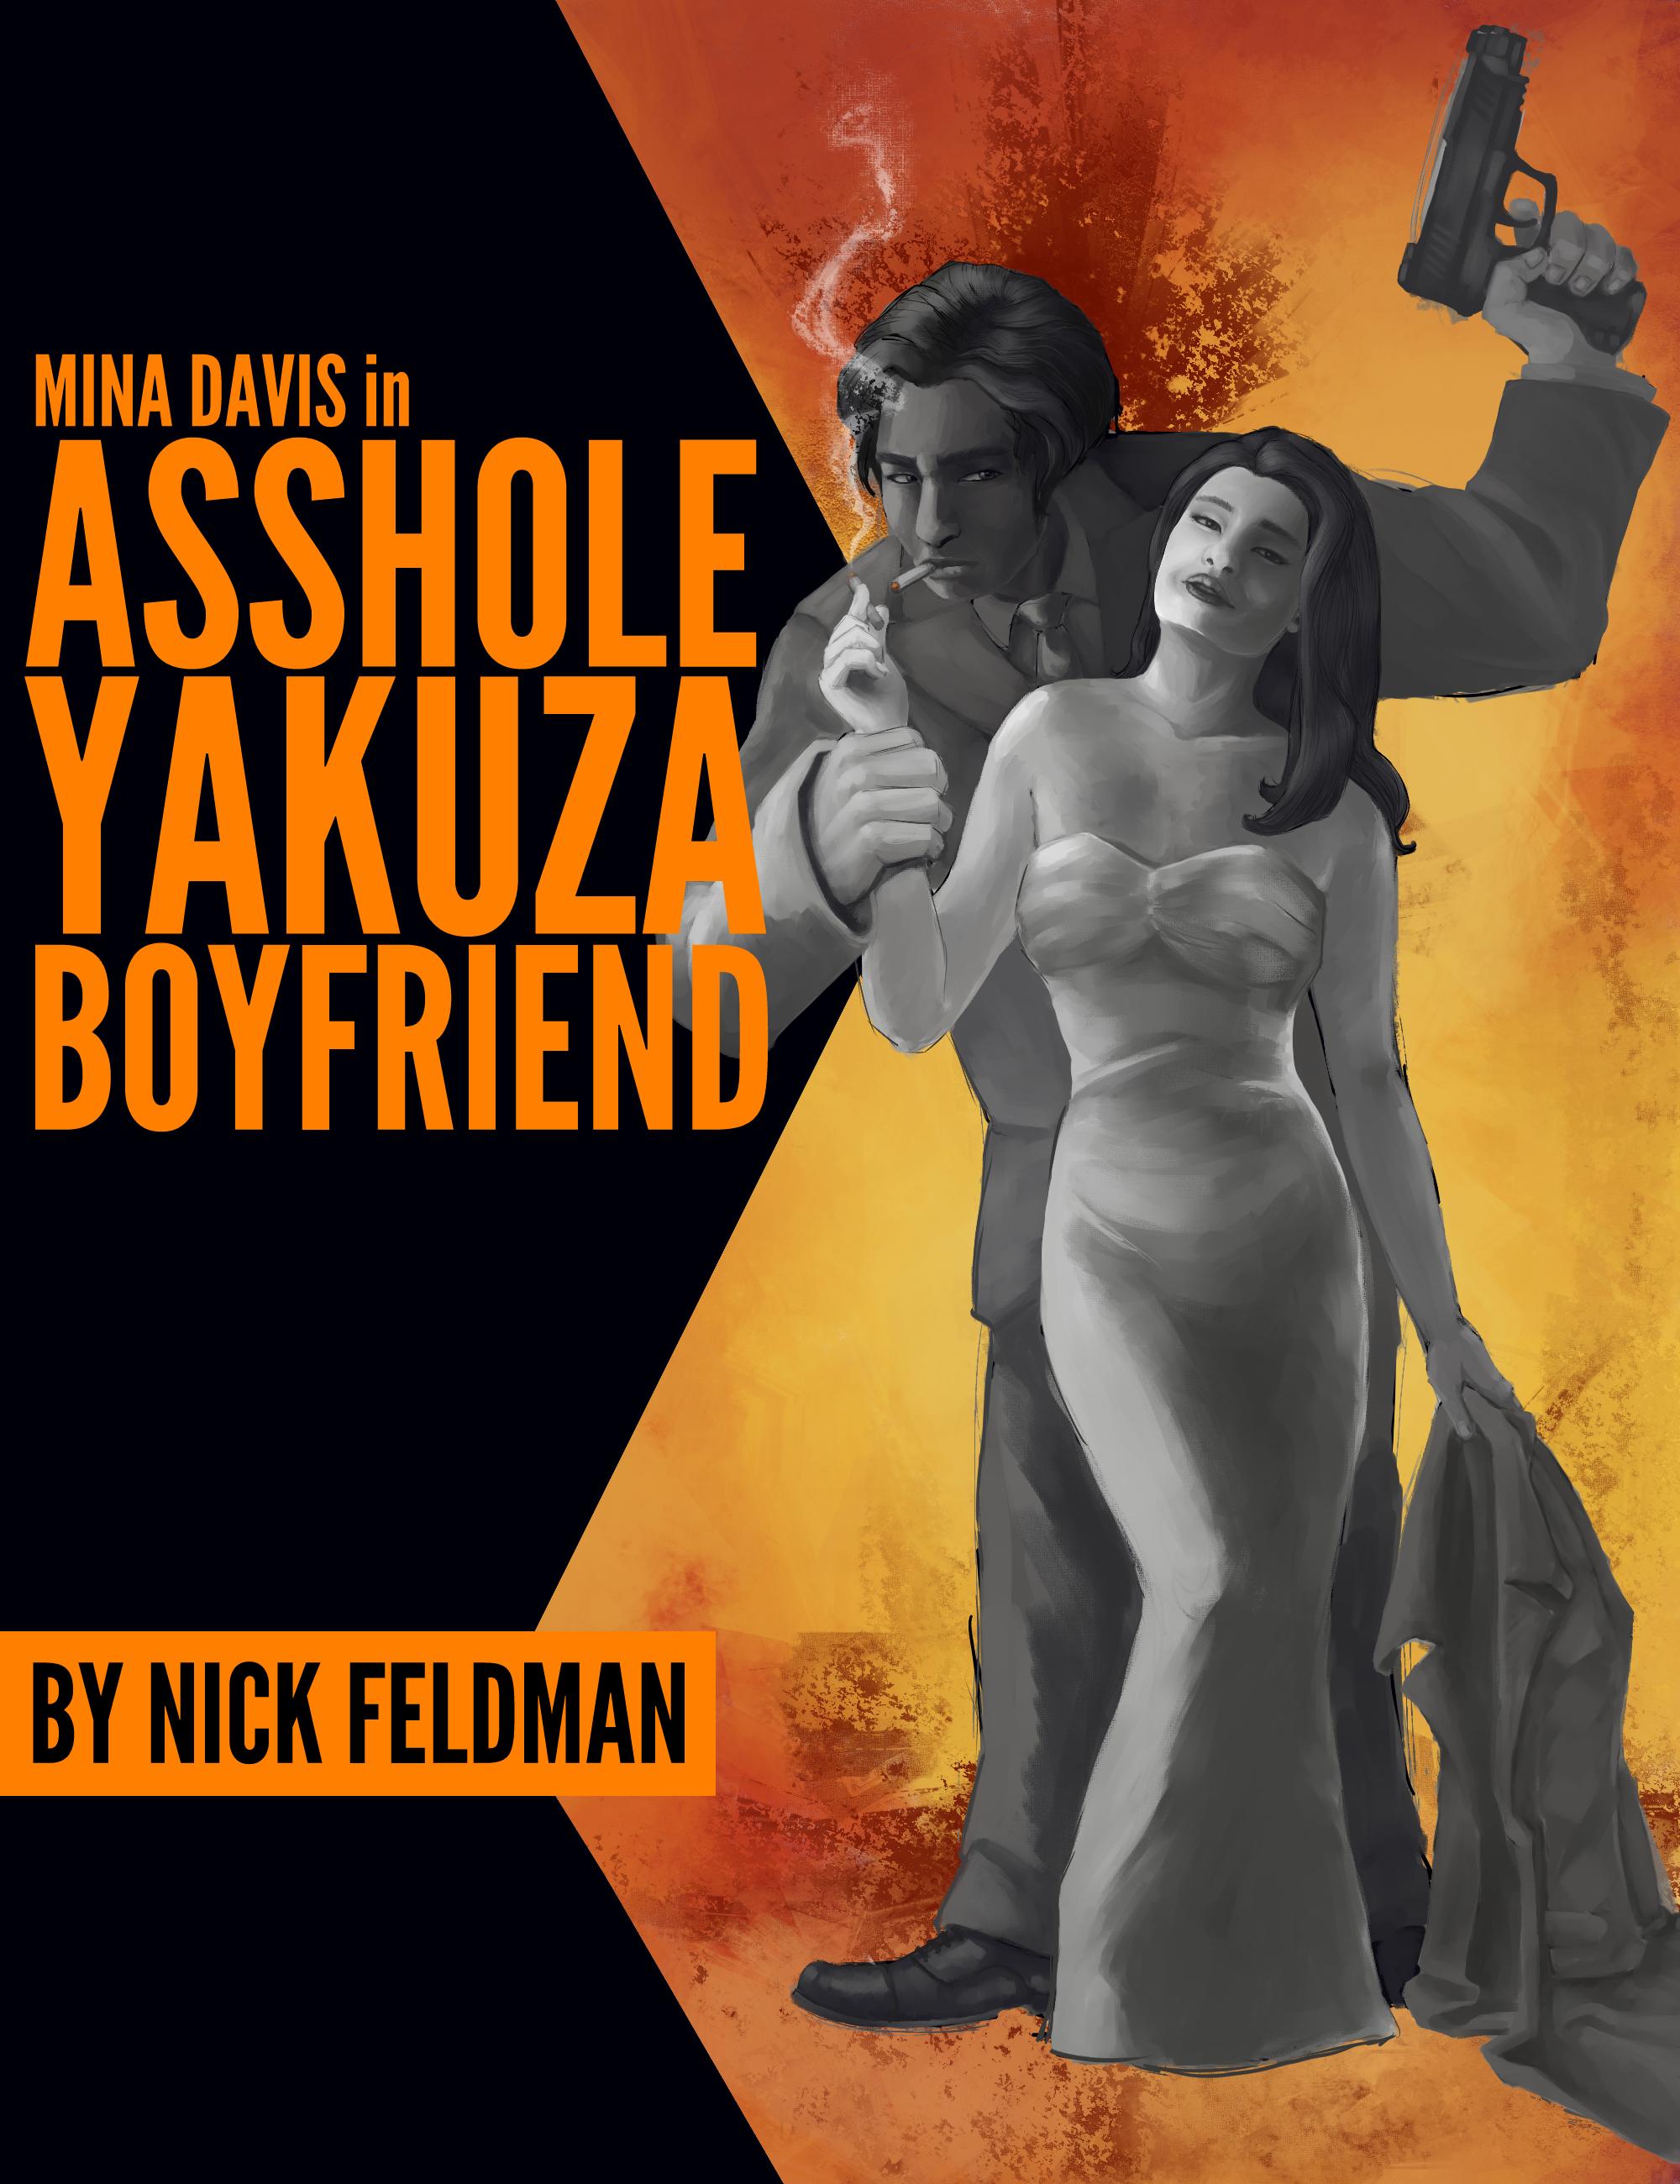 Mina Davis in Asshole Yakuza Boyfriend